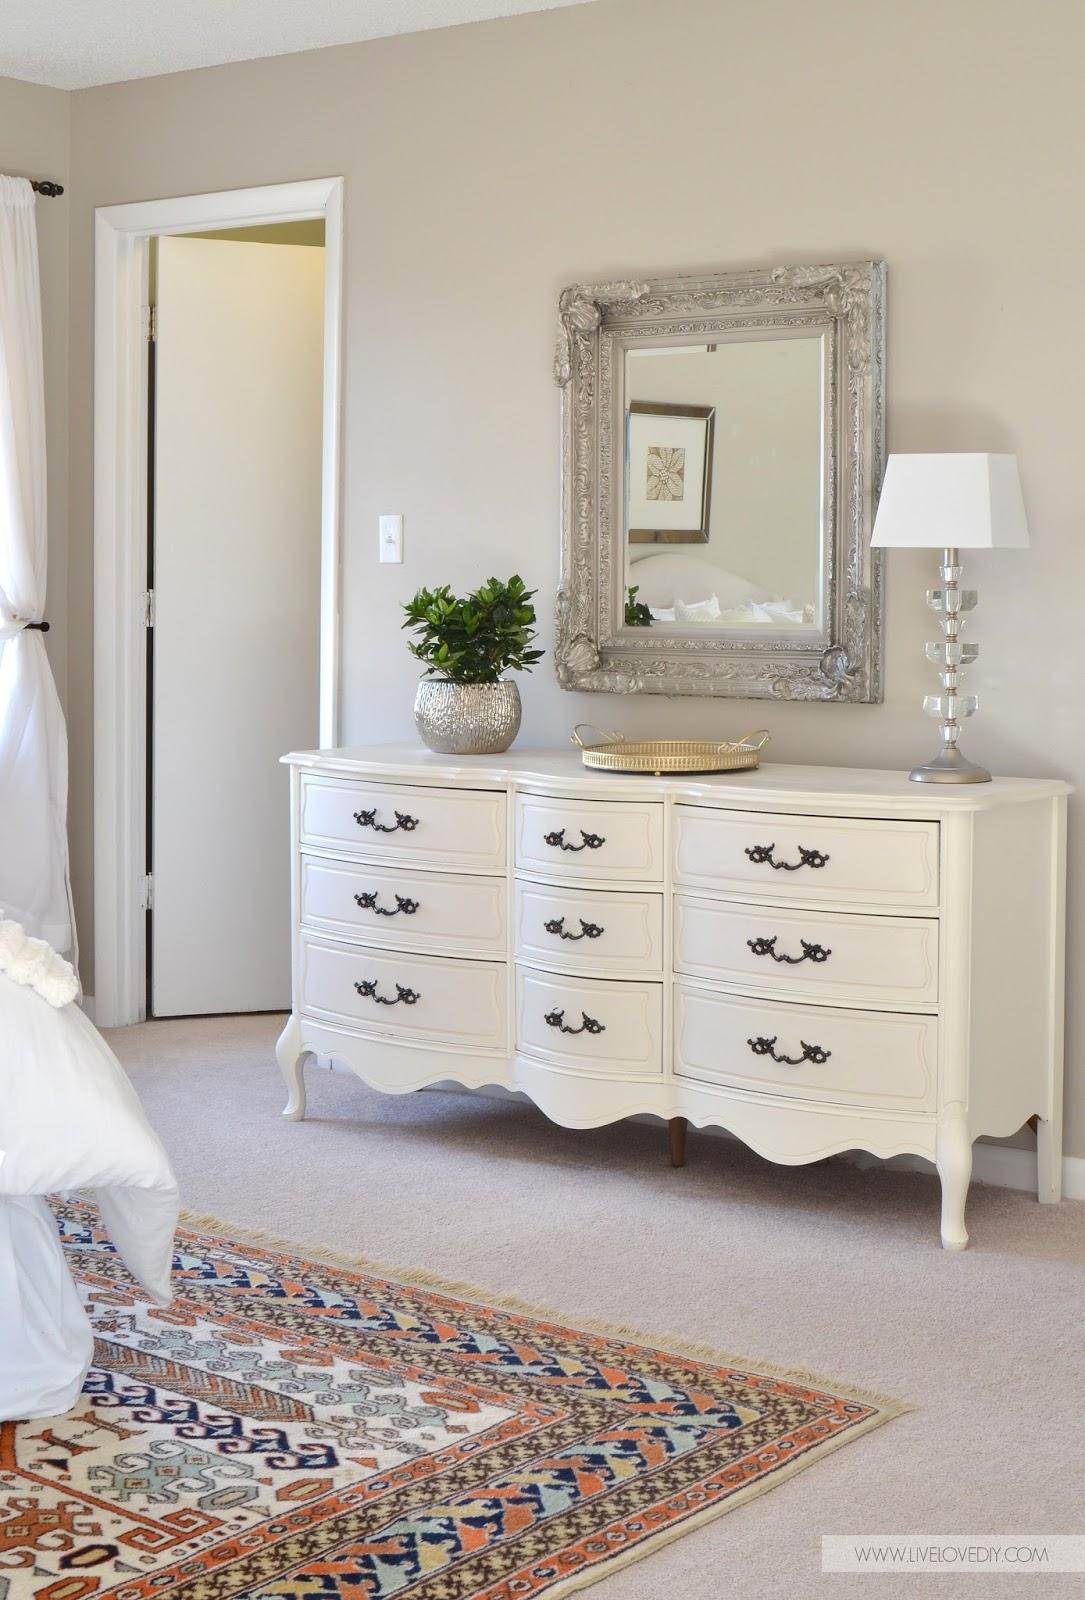 LiveLoveDIY: 10 Secrets for Buying The Best Furniture on Craigslist